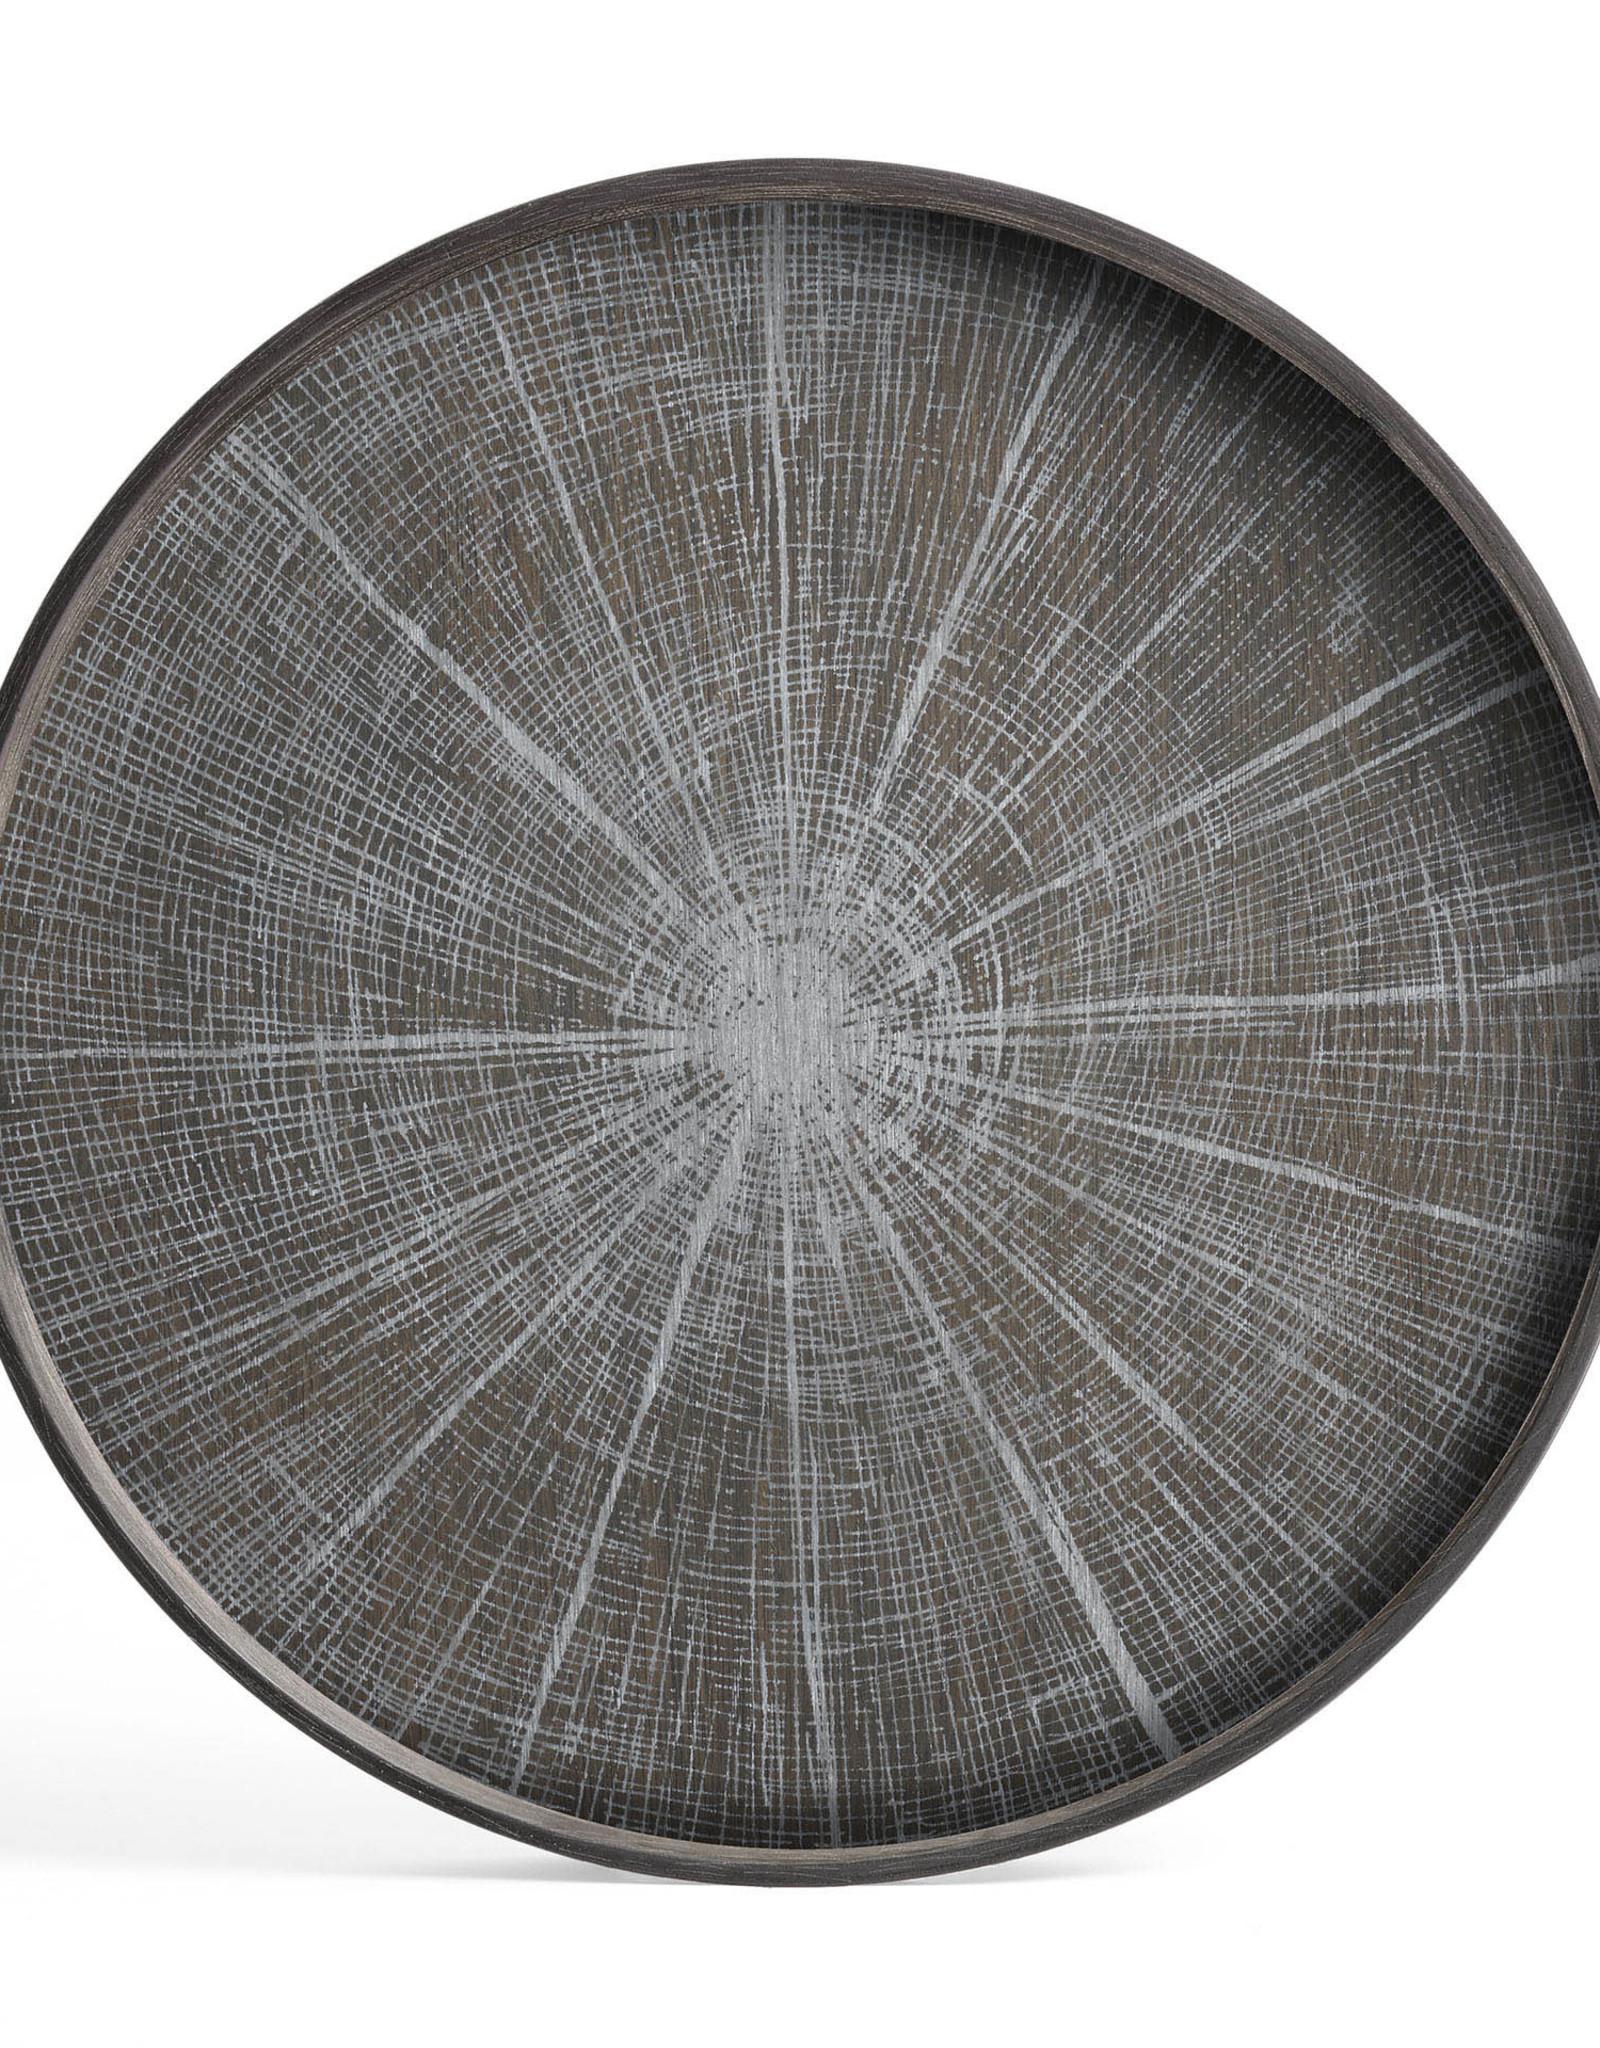 White Slice wooden tray - round - S 19 x 19 x 2